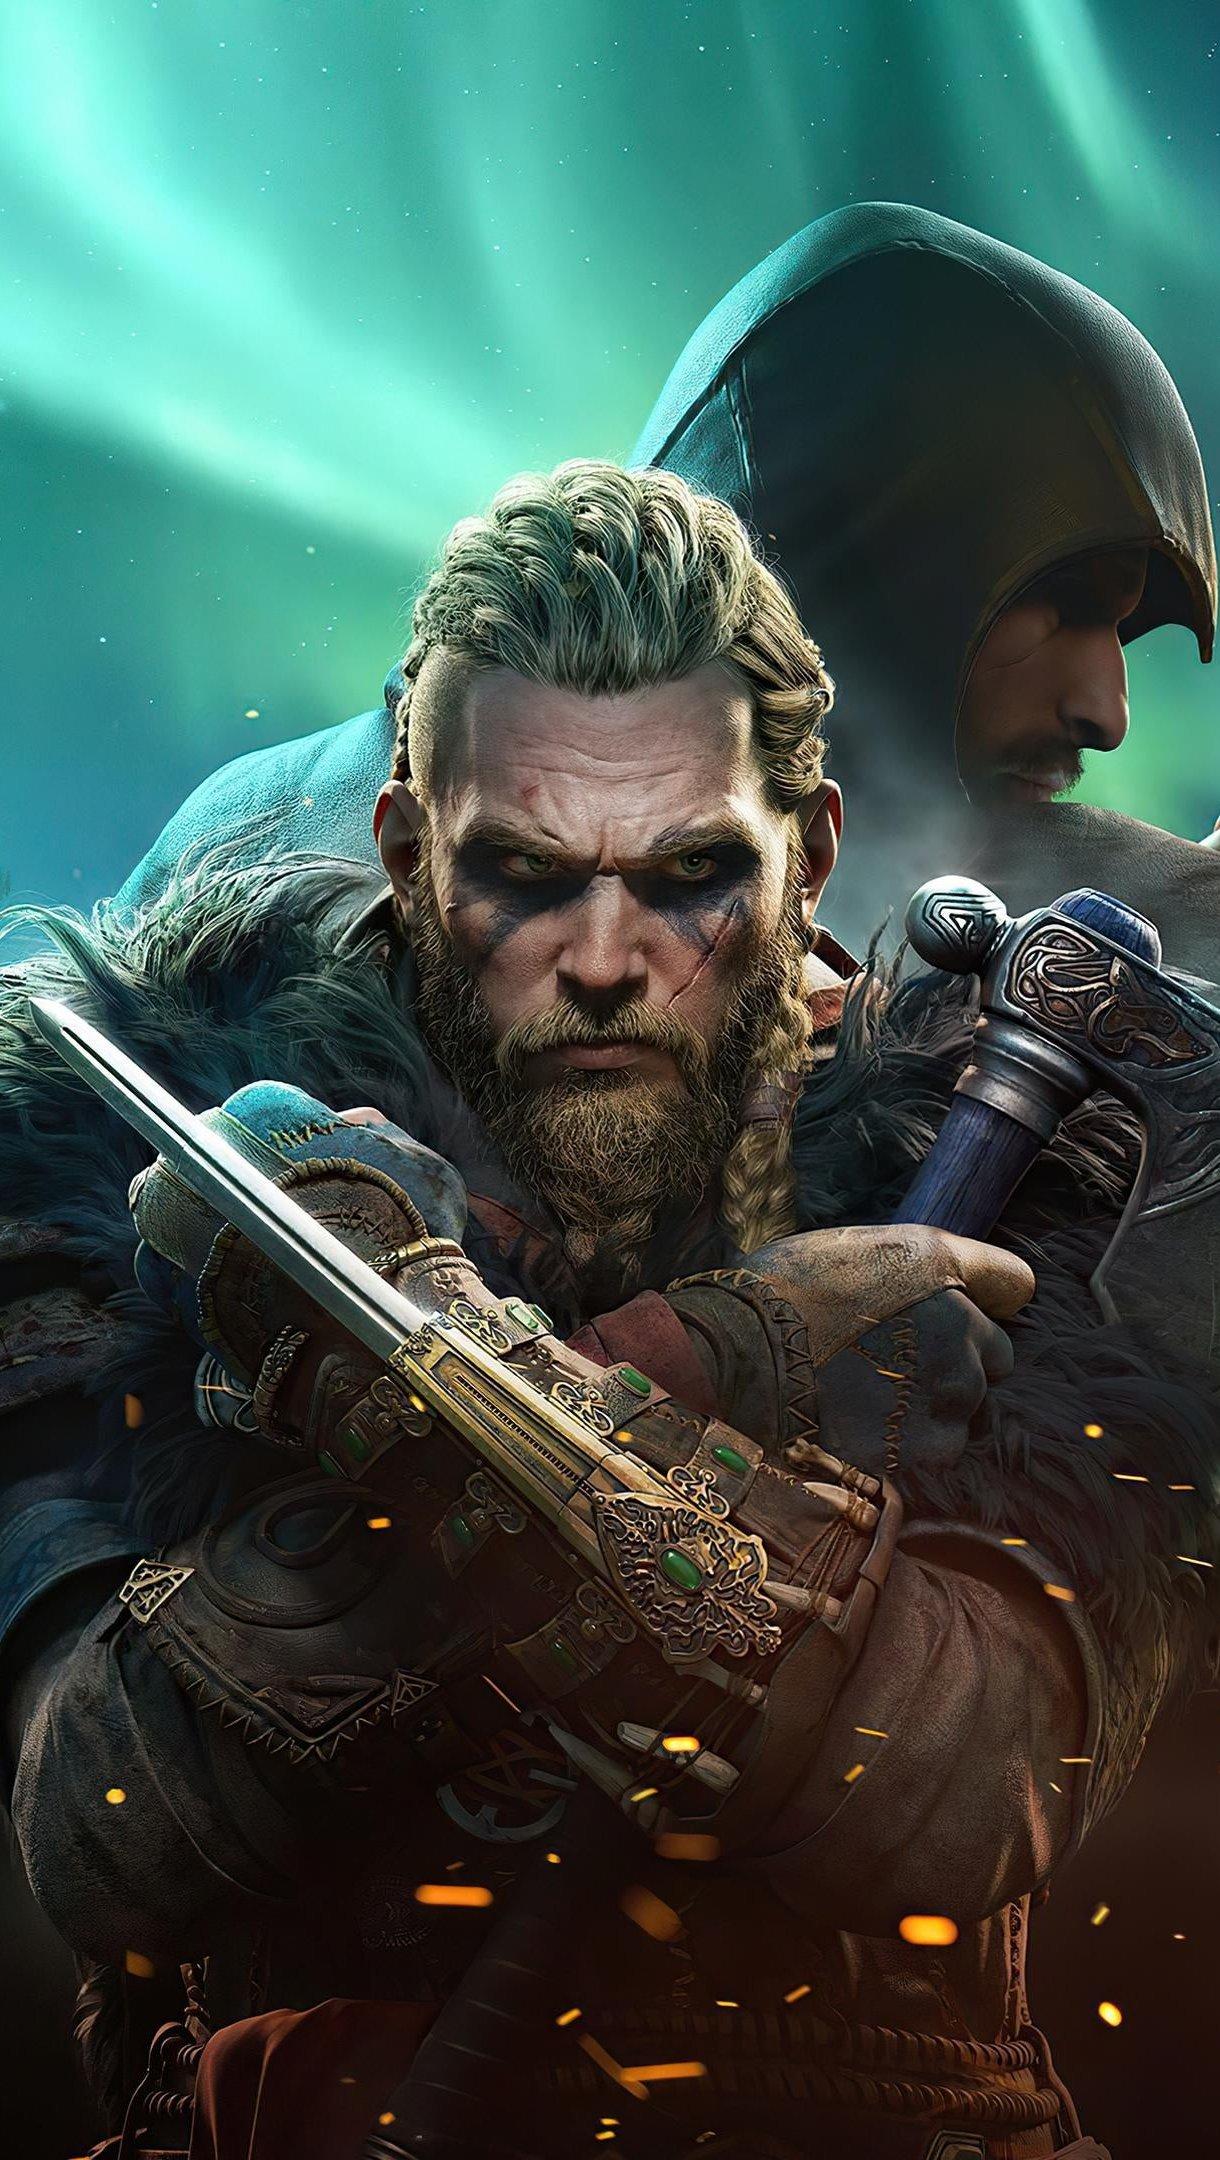 Wallpaper Ragnar Lothbrok from Assassins Creed Vertical